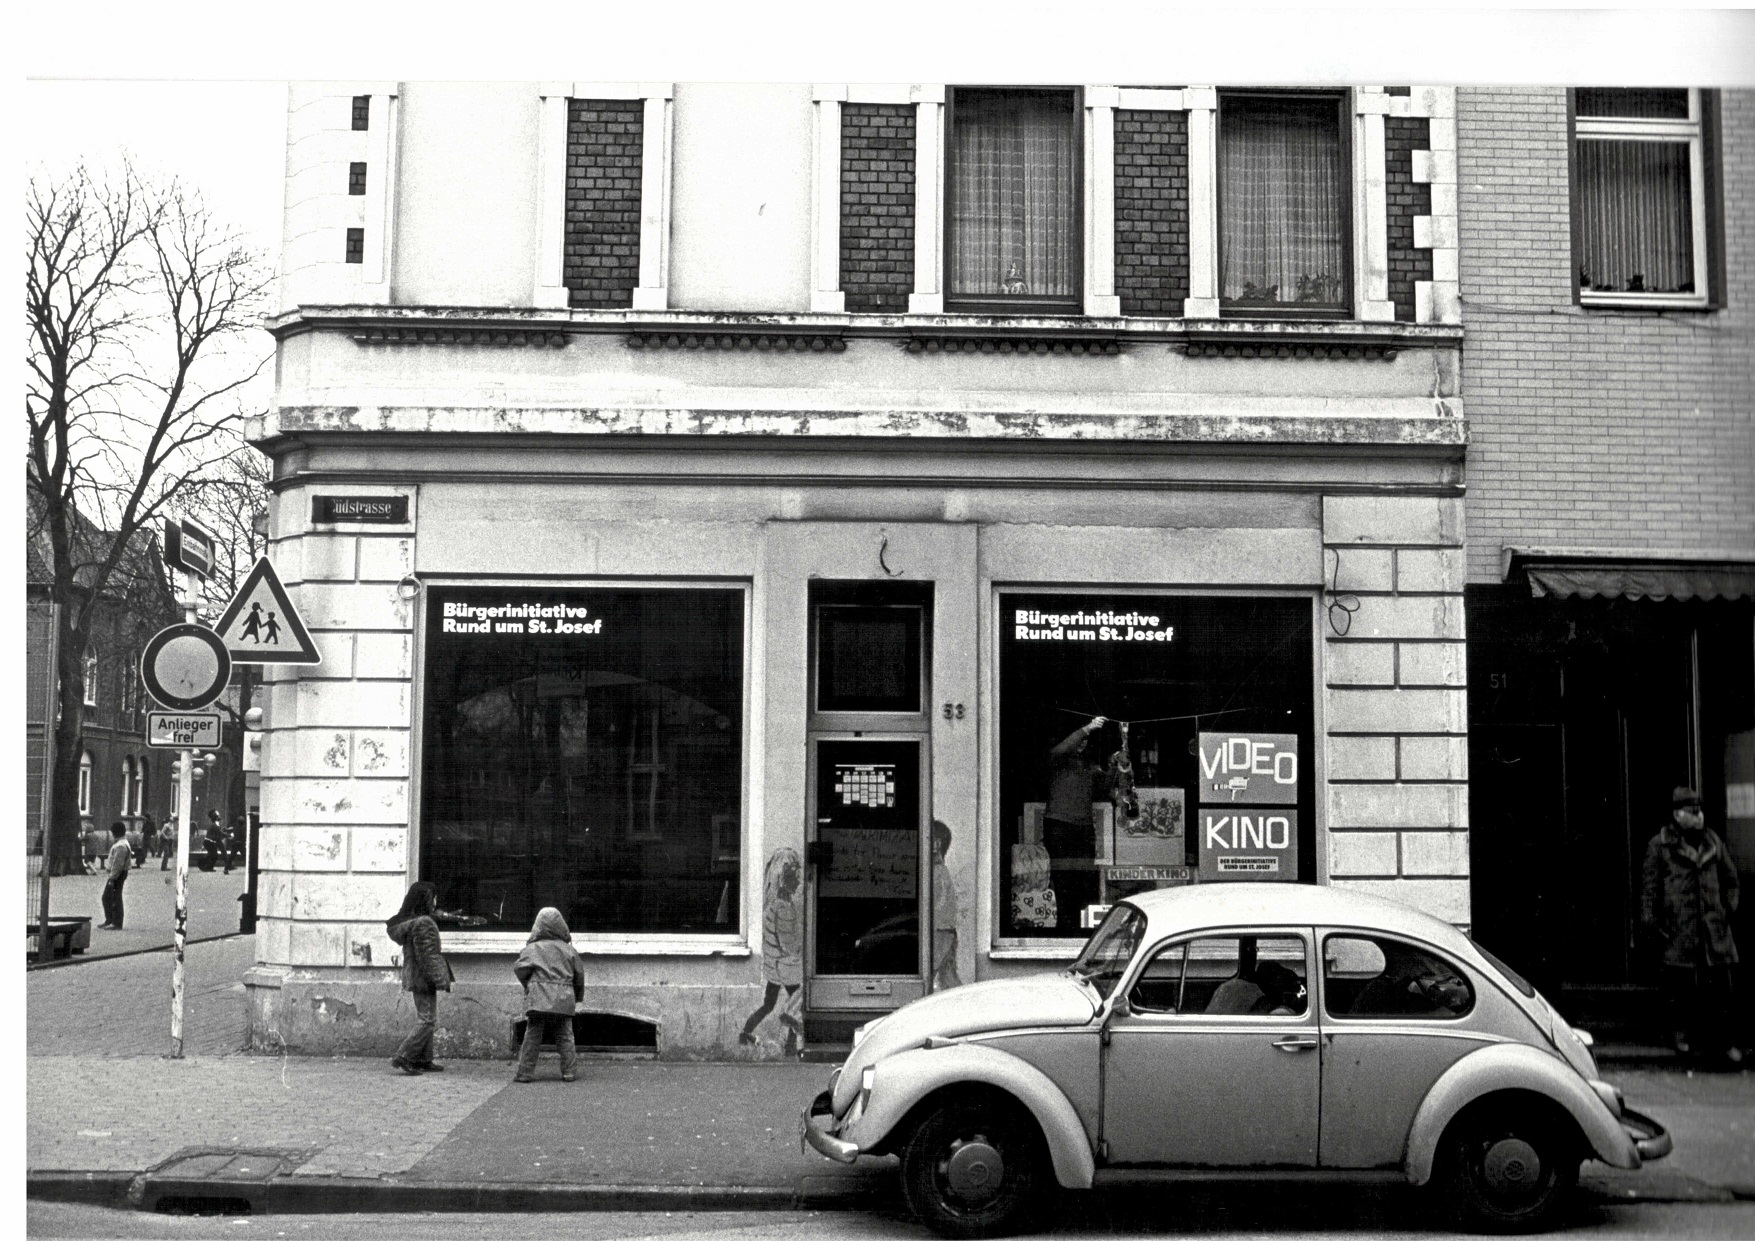 1979 Ladenlokal der BI